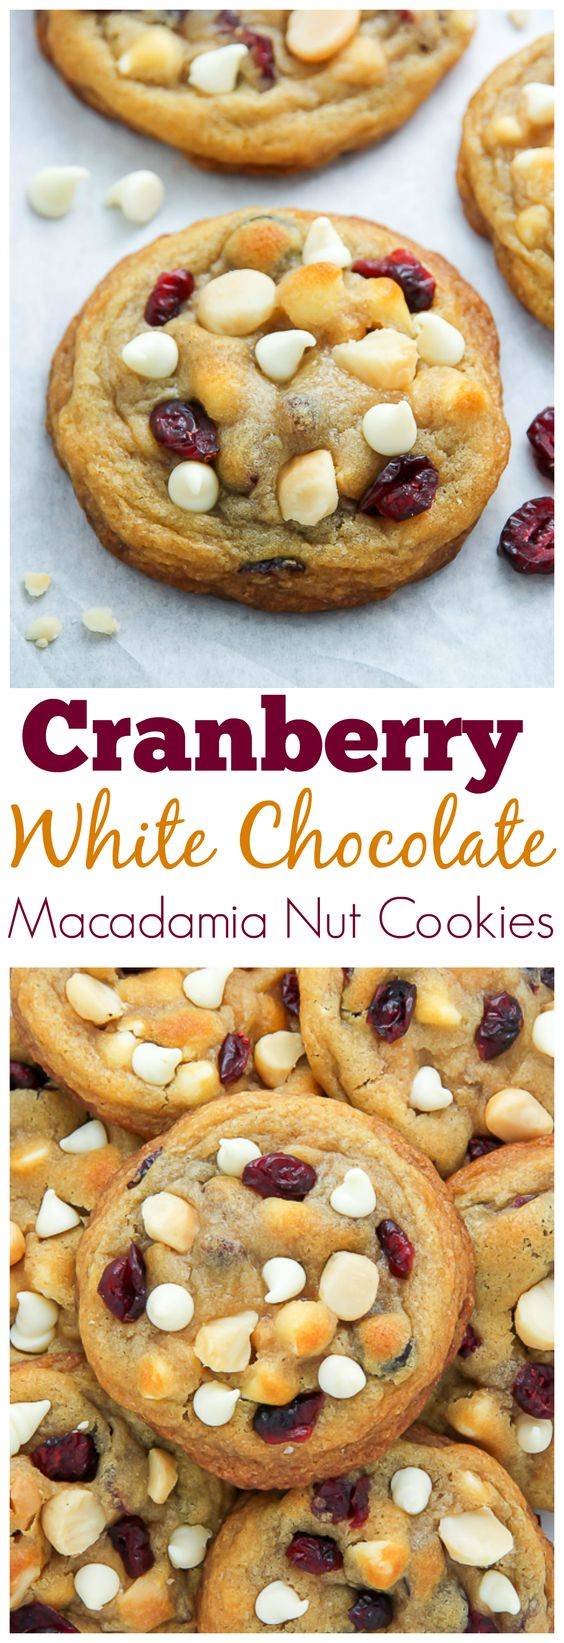 Cranberry White Chocolate Macadamia Nut Cookies | Recipe ...